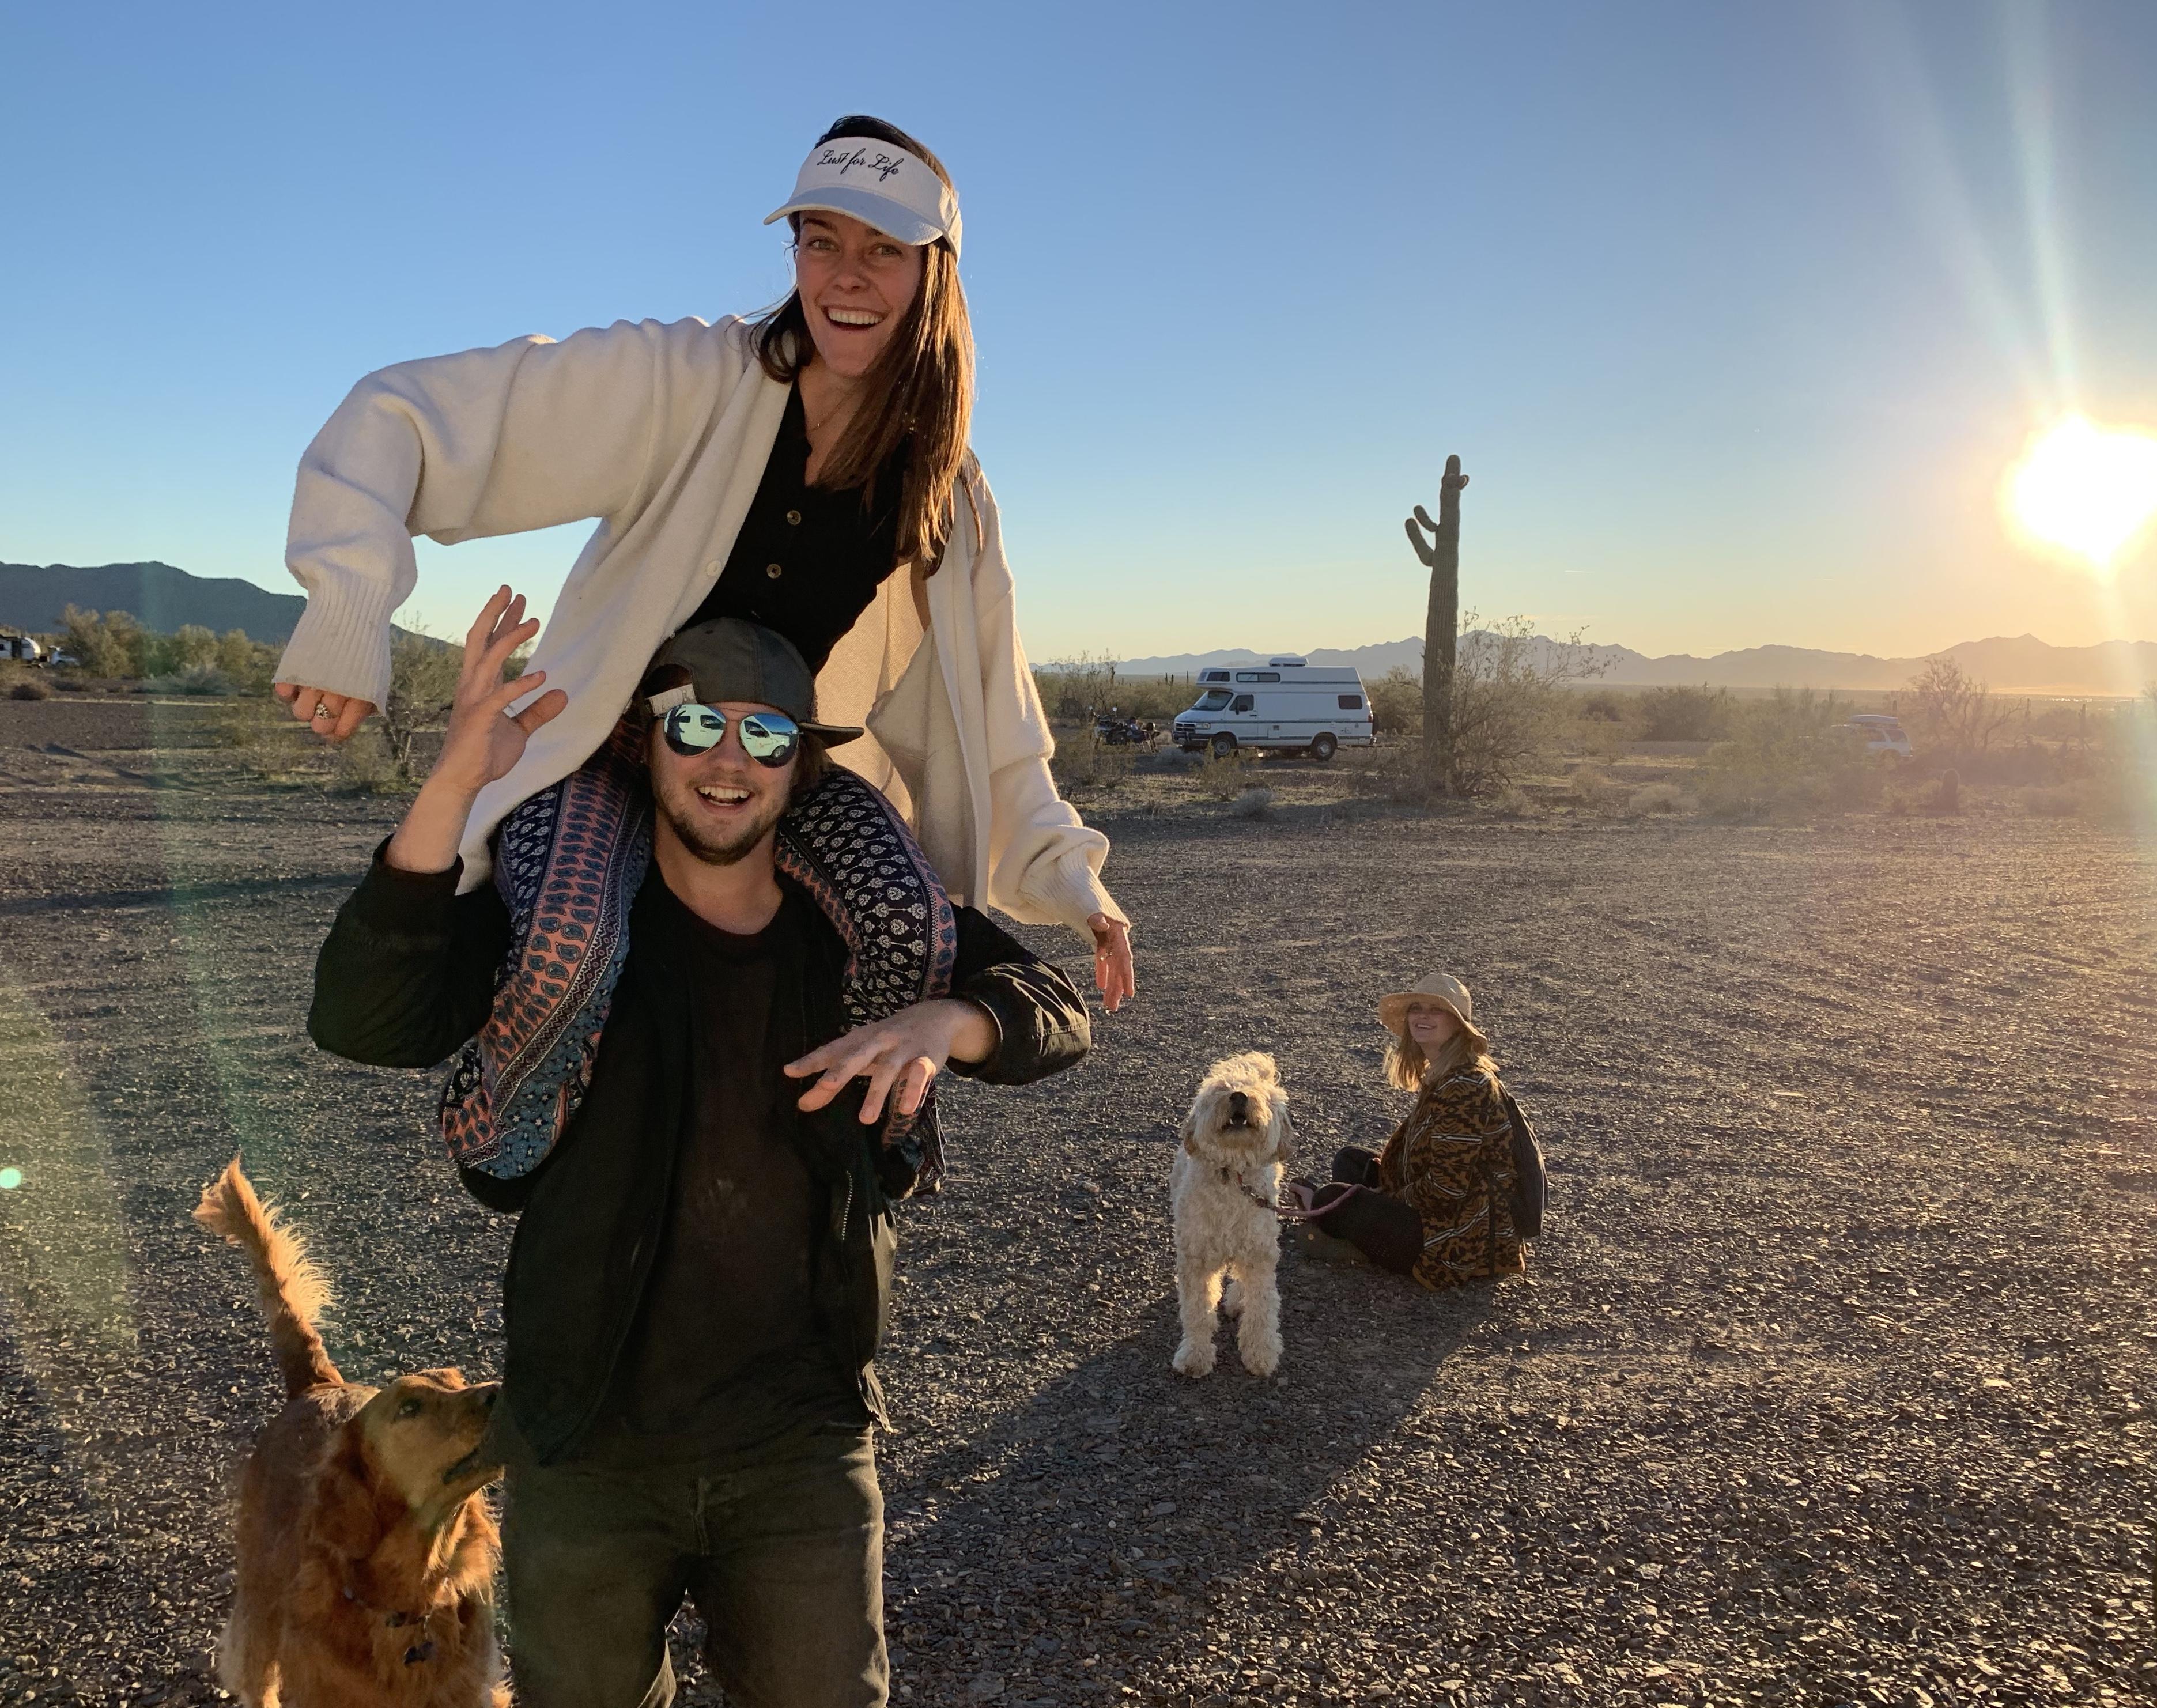 vanlife gathering friends with dogs desert sunset